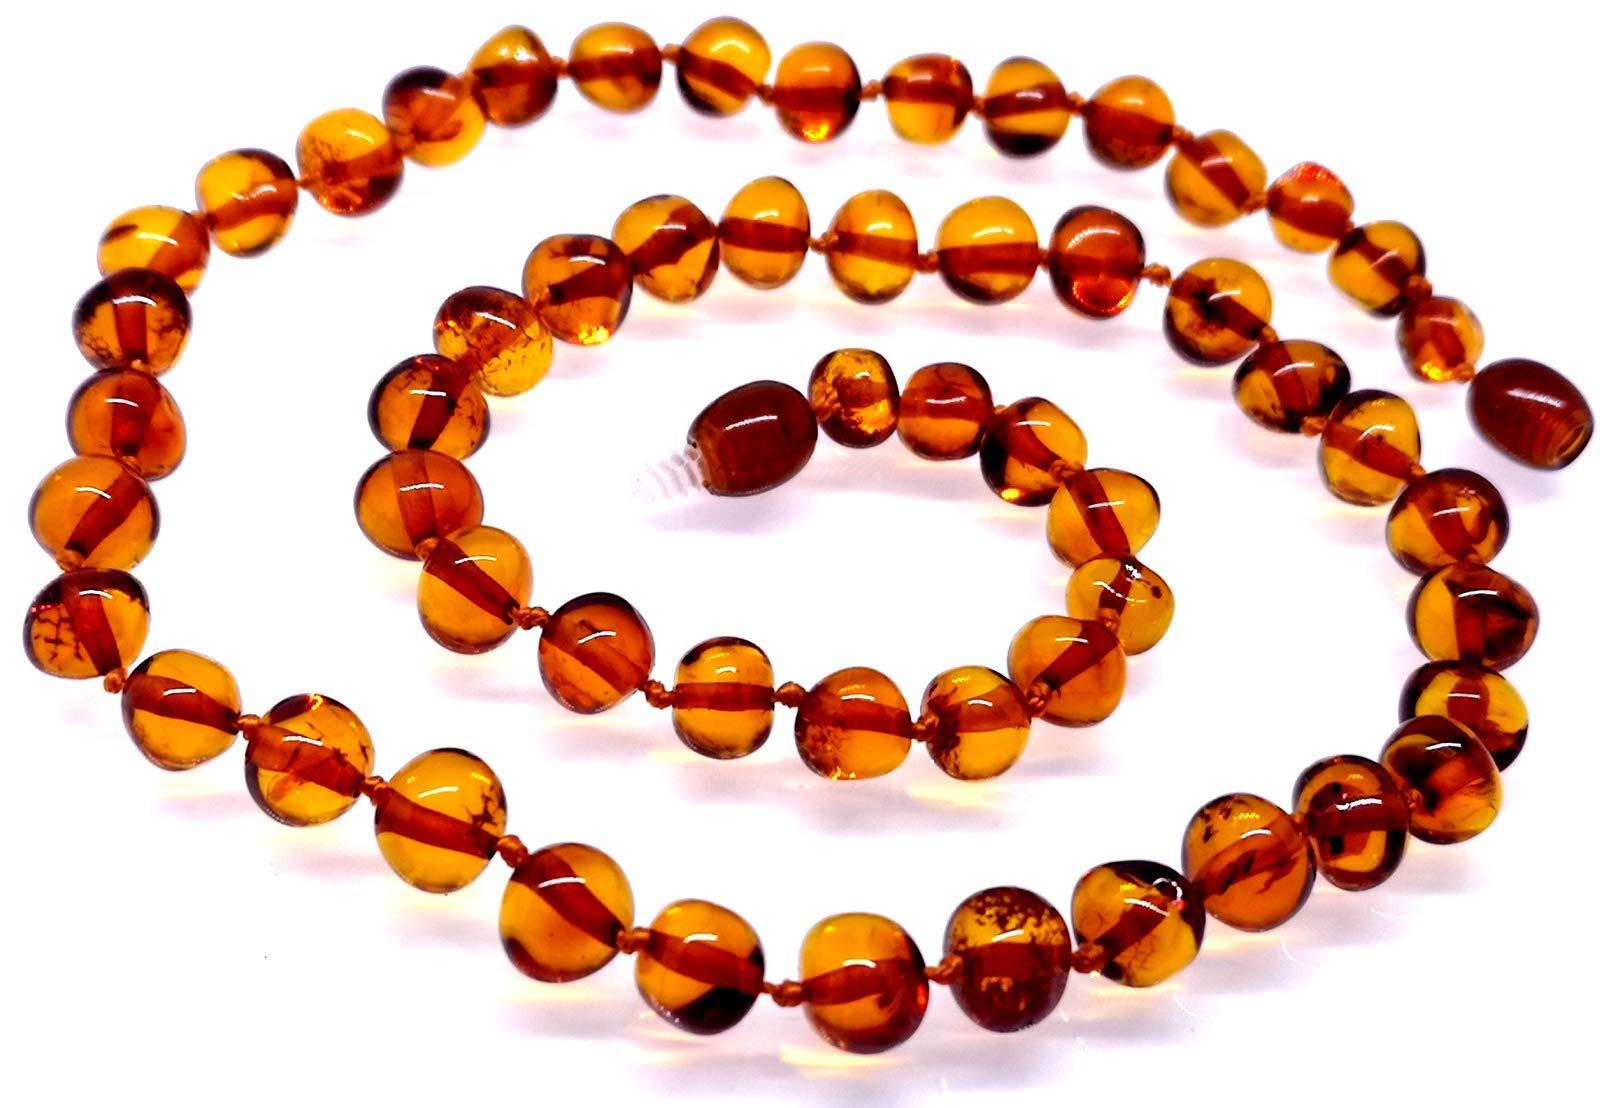 AMBERMILANA Baltic Amber Necklace Women/Cognac Baroque Beads/Healing Amber Necklace/Certified Genuine Baltic Amber